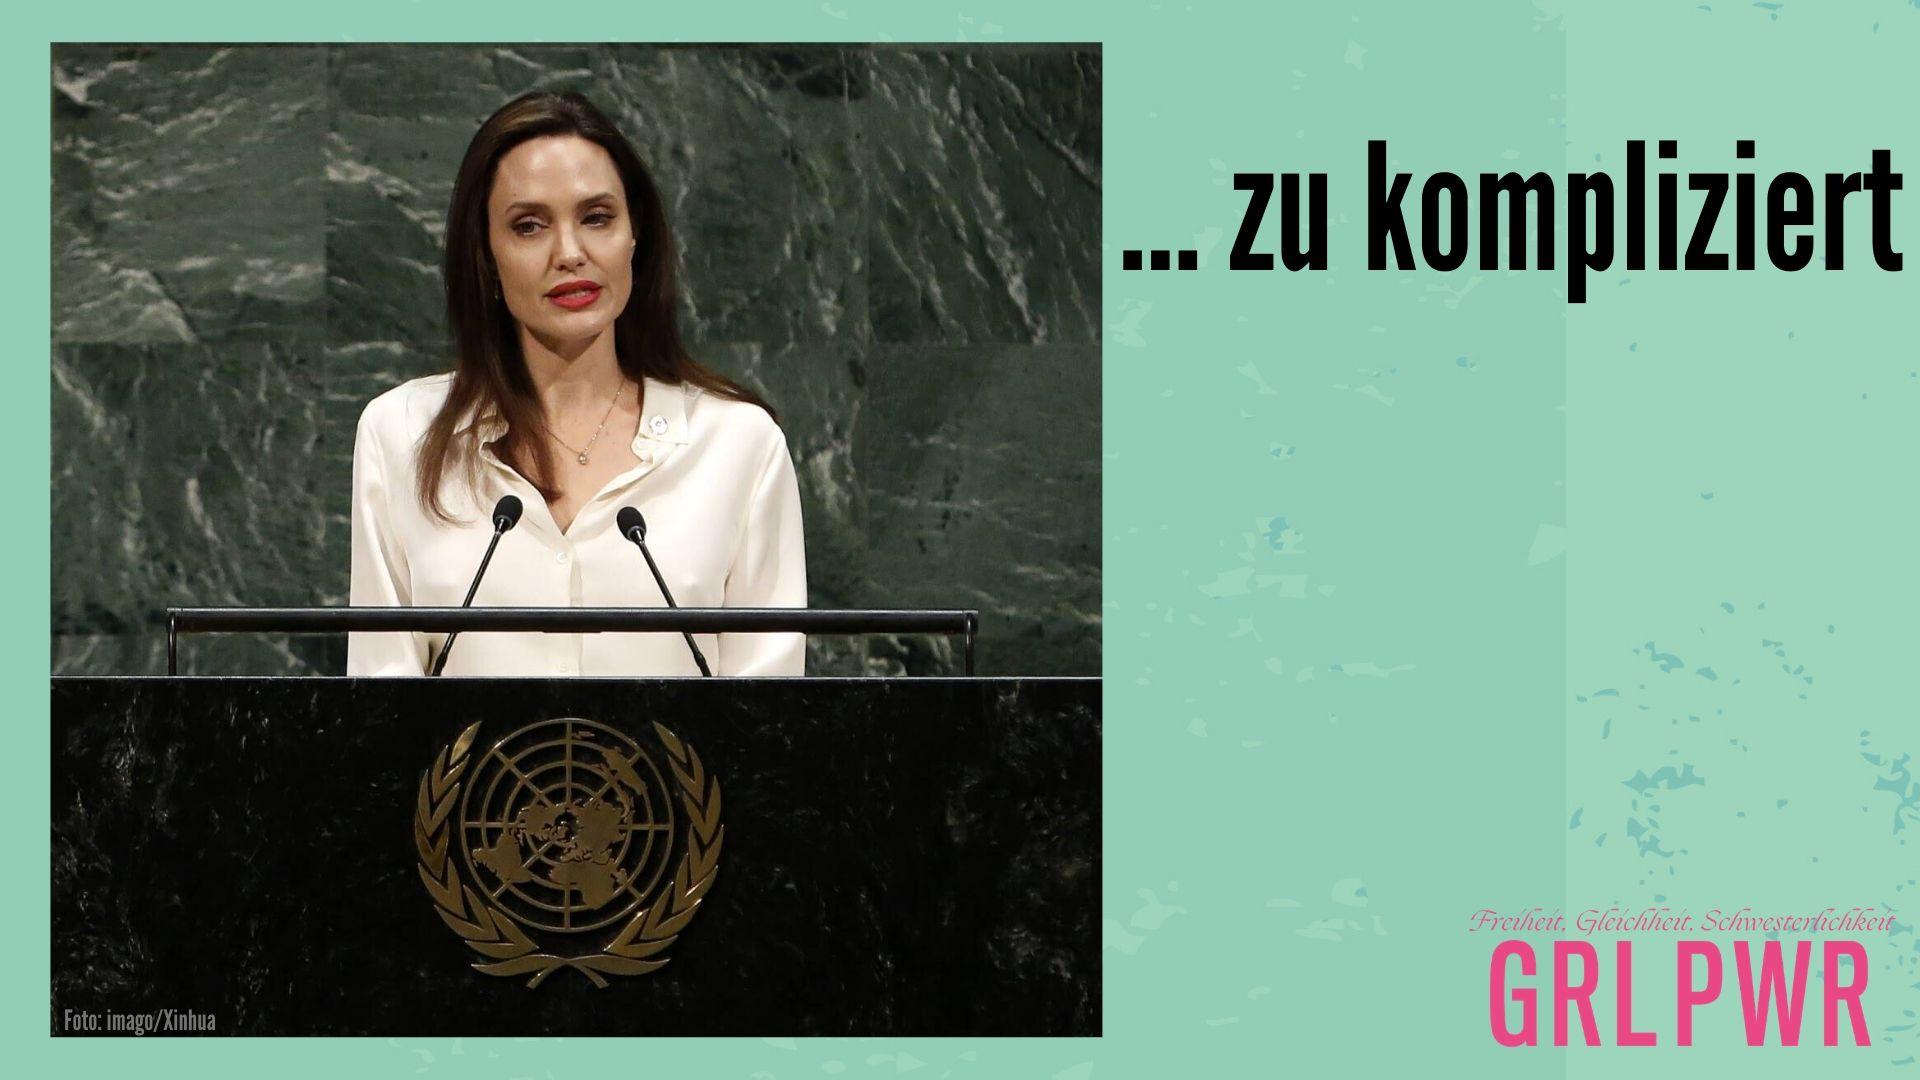 GRL PWR: Angelina Jolie